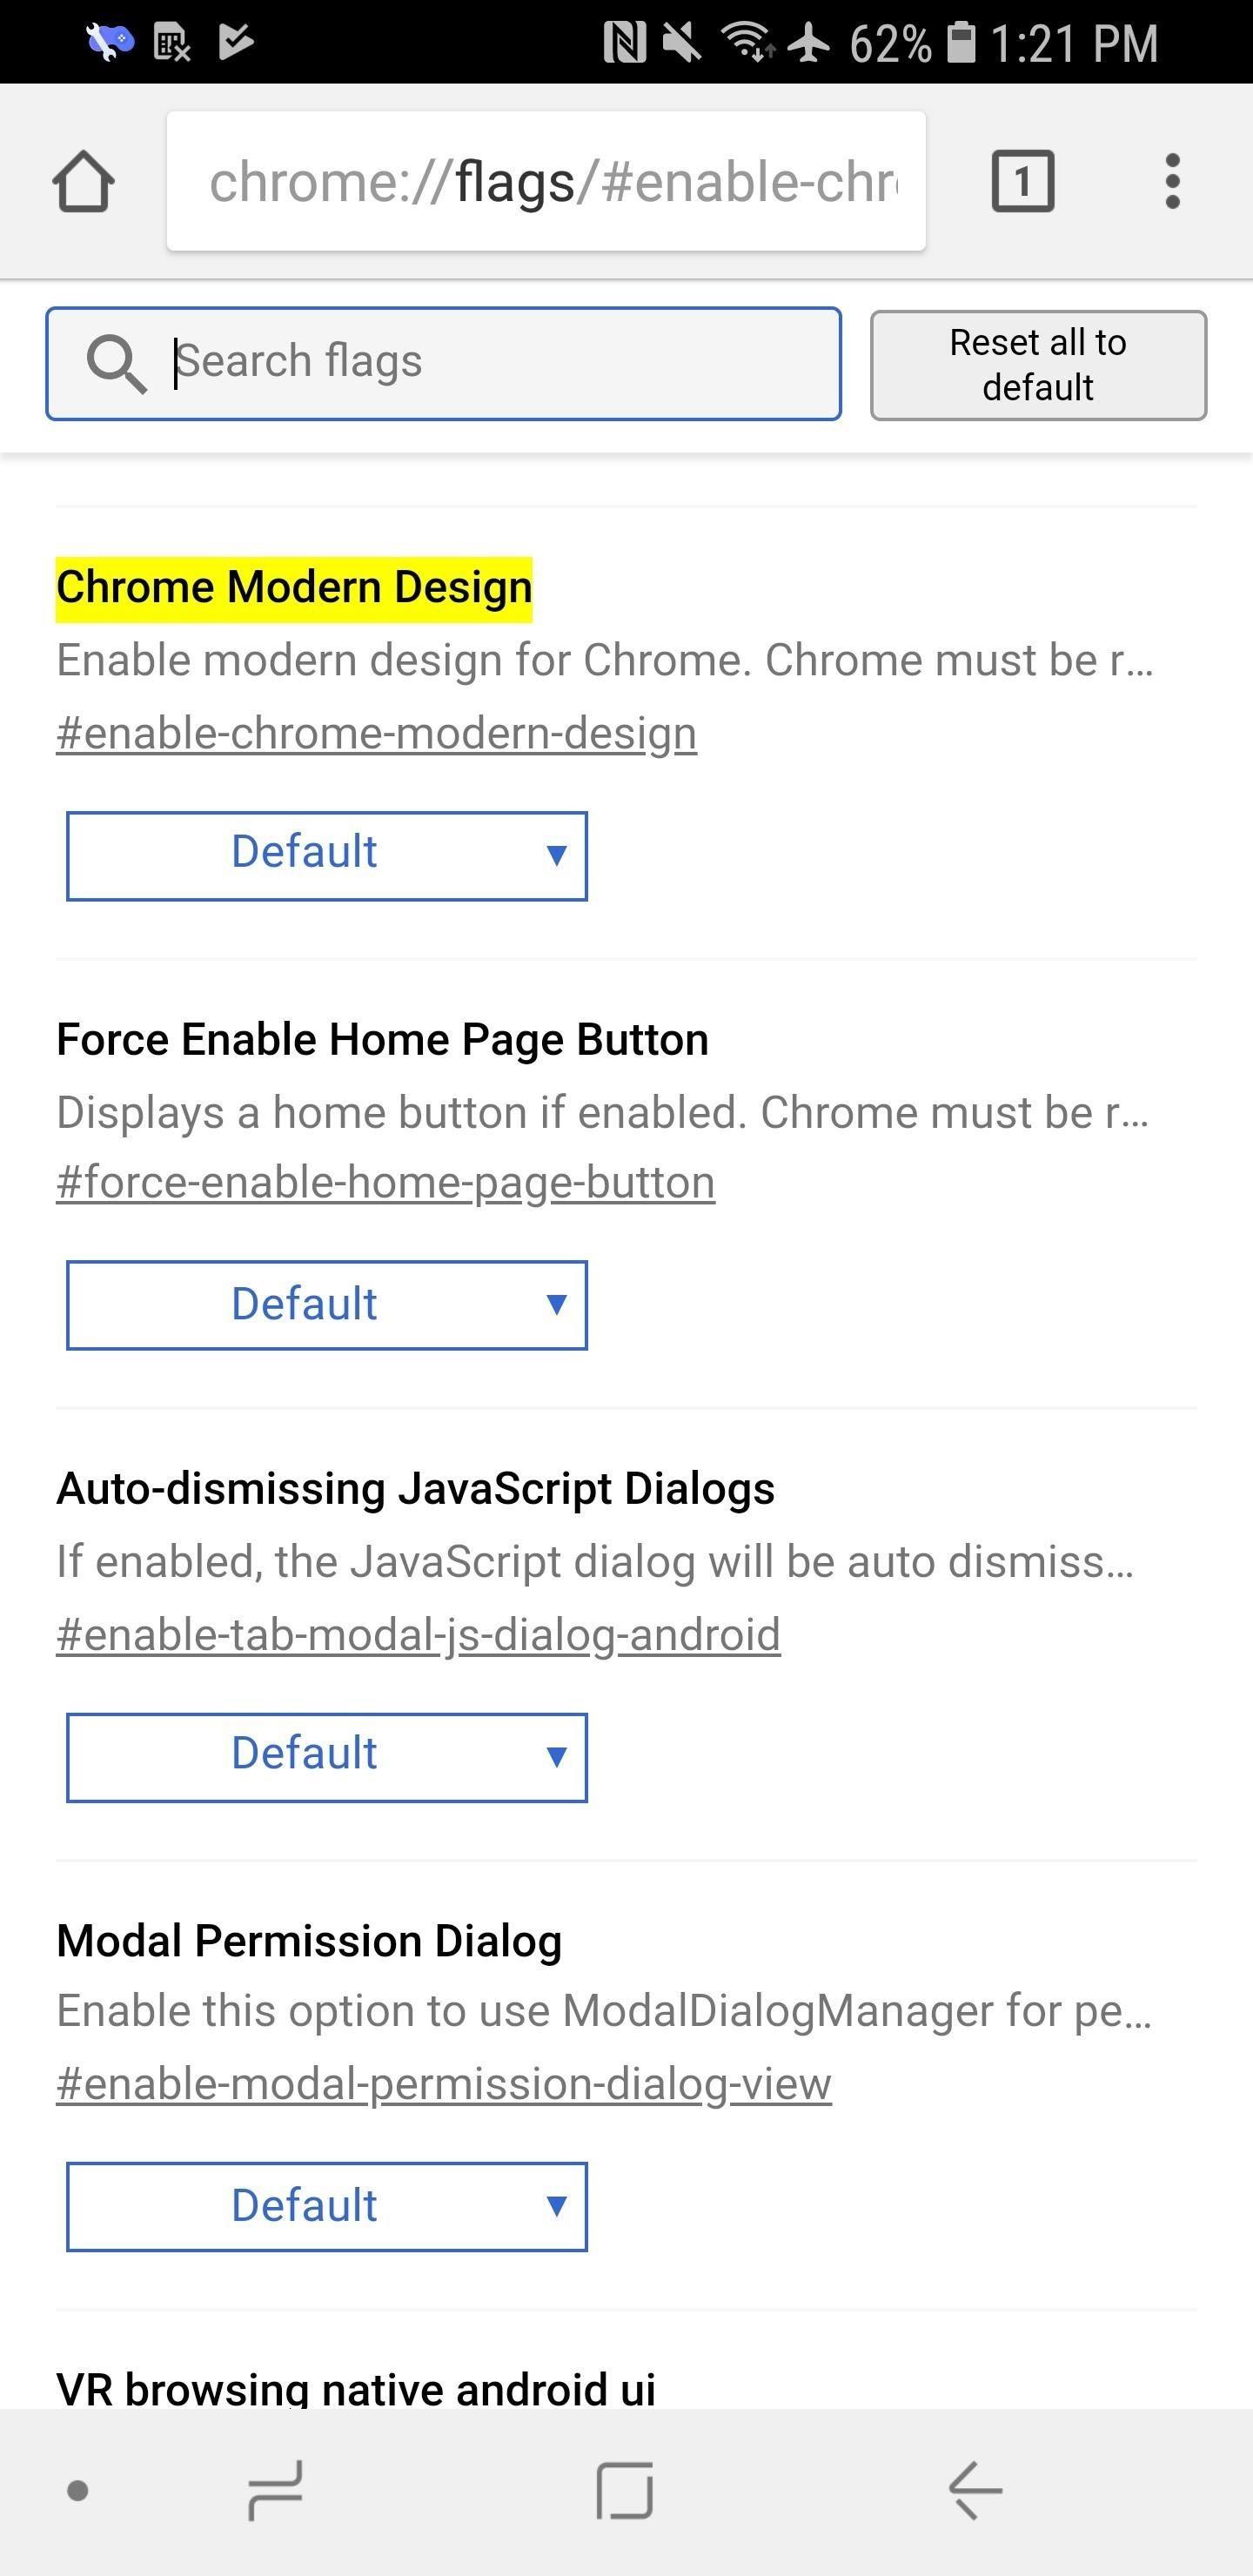 Google Chrome 101: كيفية فتح واجهة مستخدم تصميم المواد 2 مع رموز الجولة وشريط الحالة المختلط